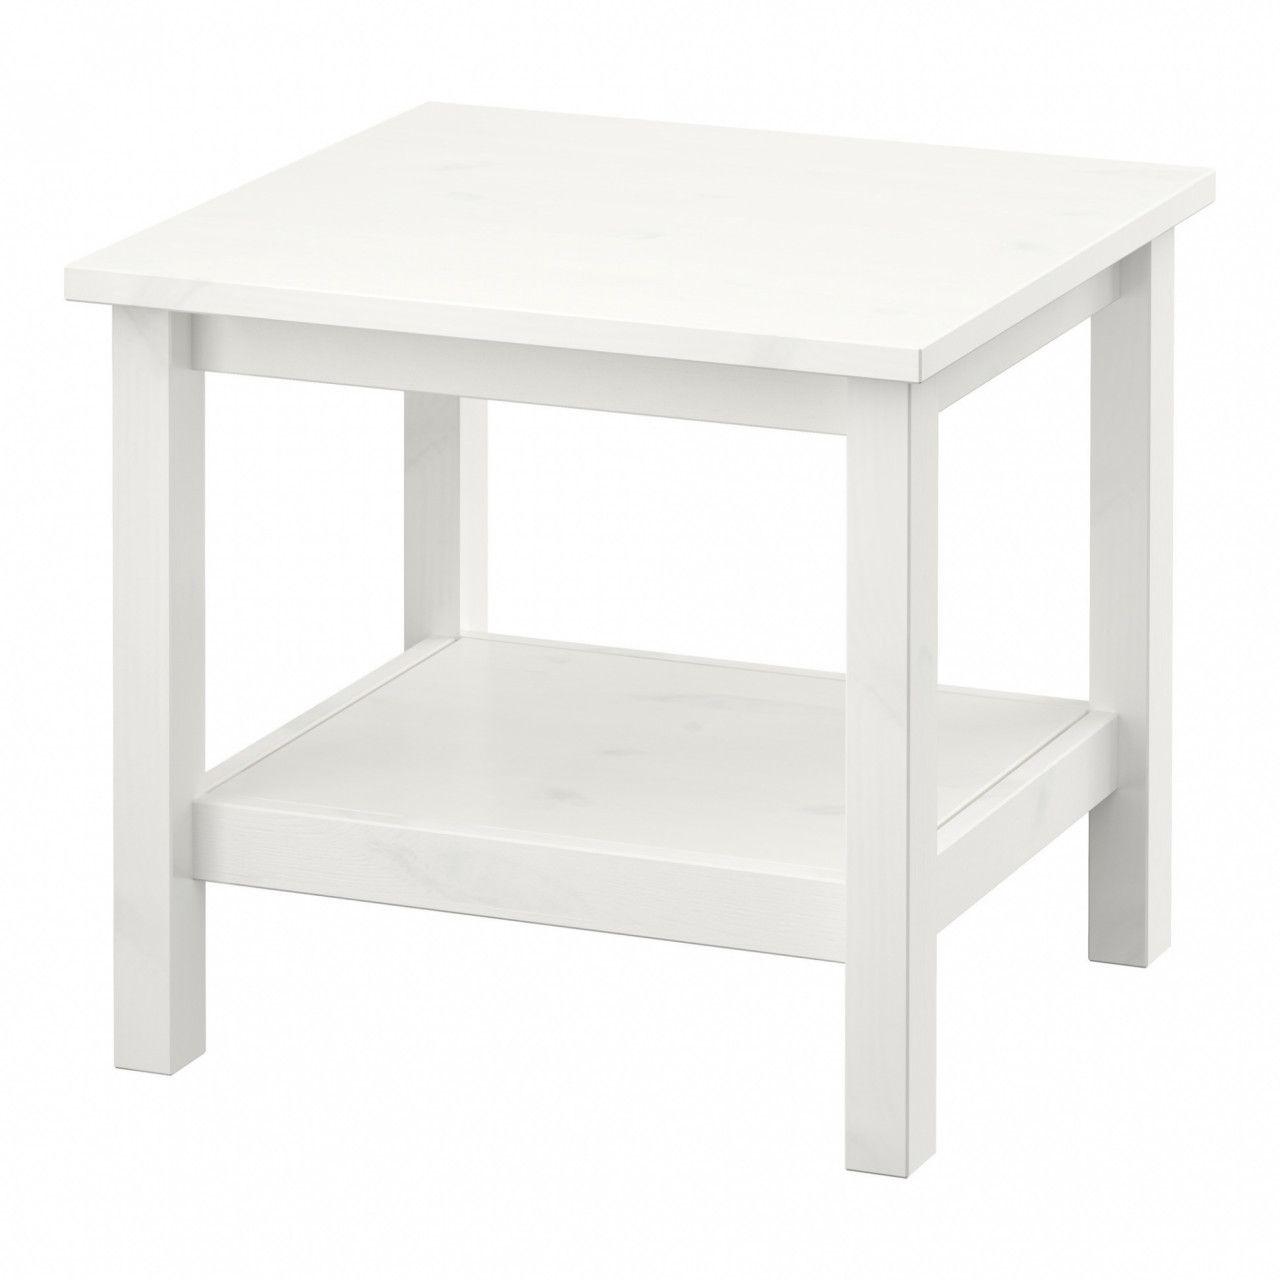 13+ White square coffee table ikea ideas in 2021